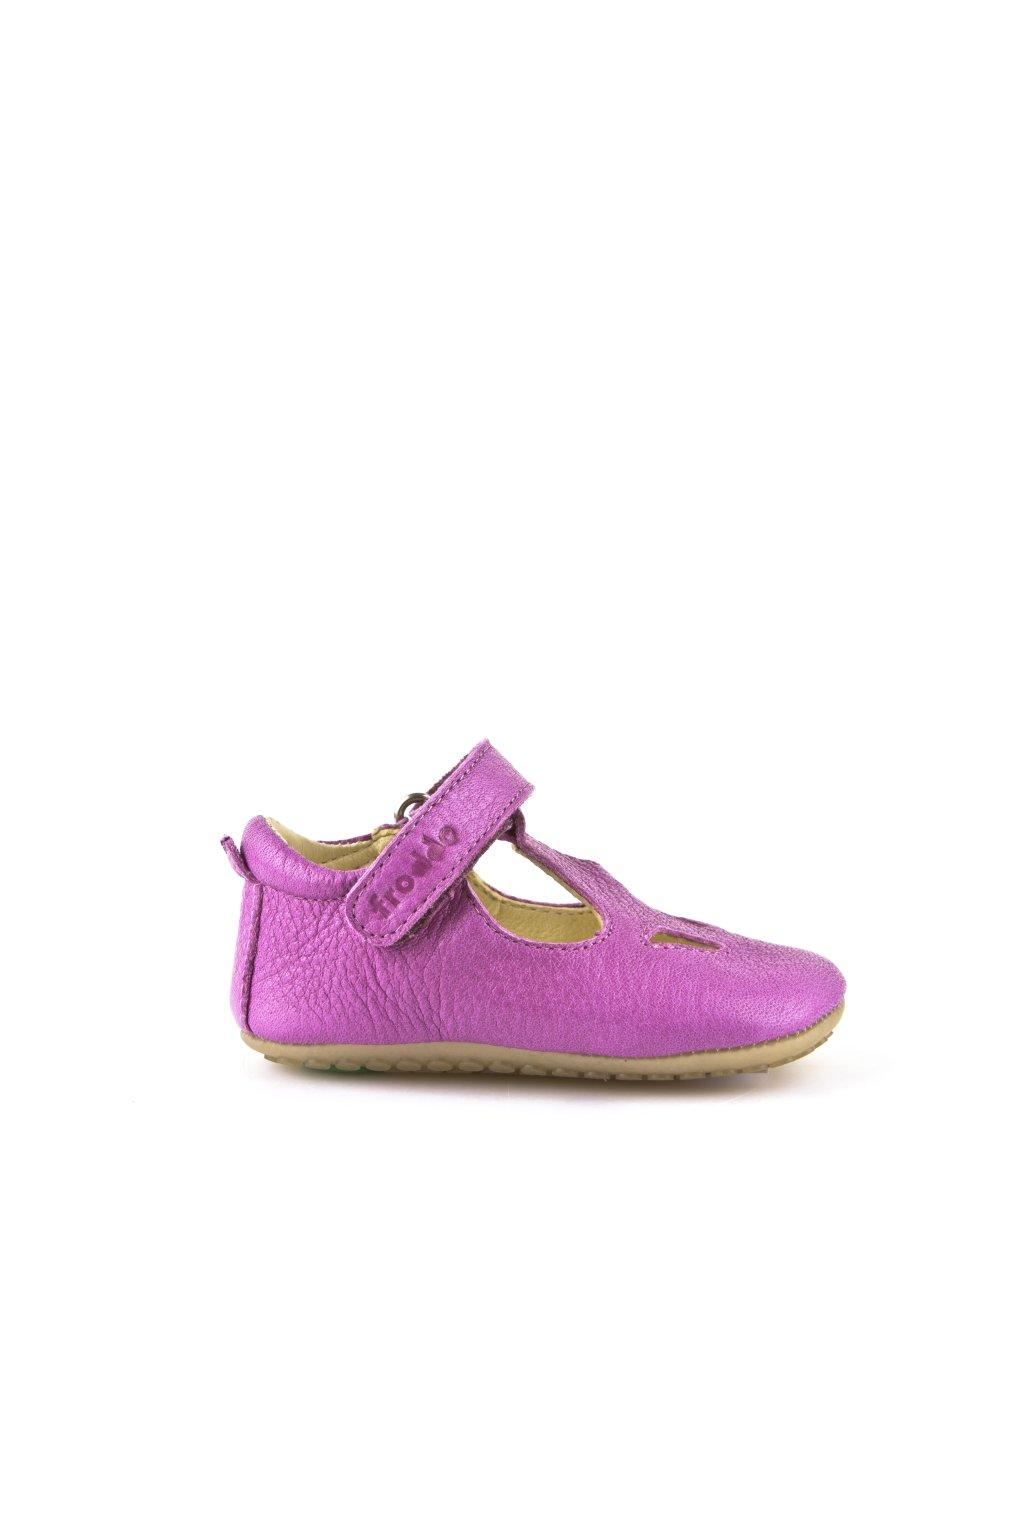 Froddo Prewalkers sandals Fuchsia